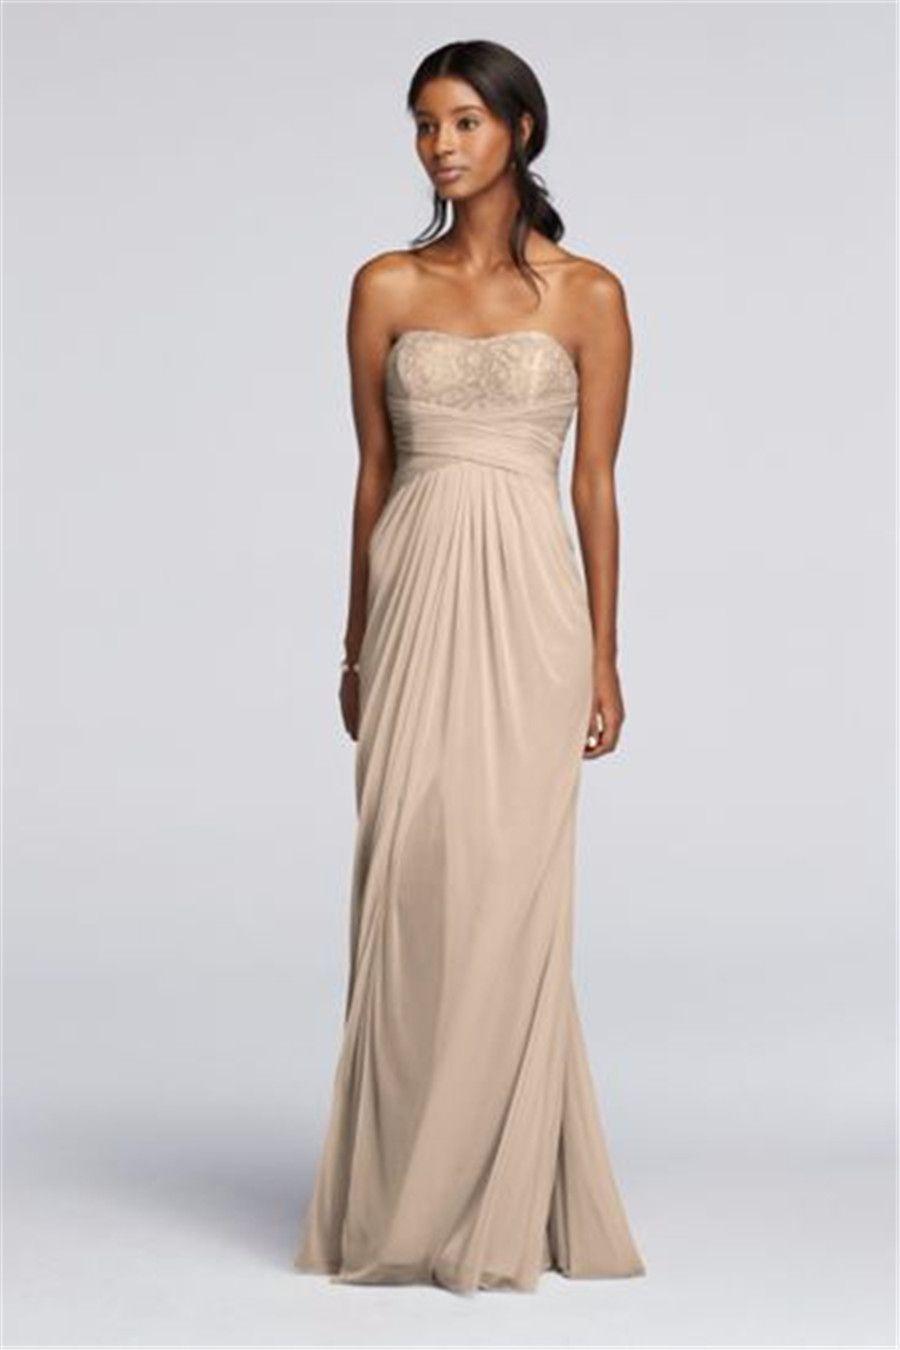 Strapless Champagne Chiffon Bridesmaid Dresses